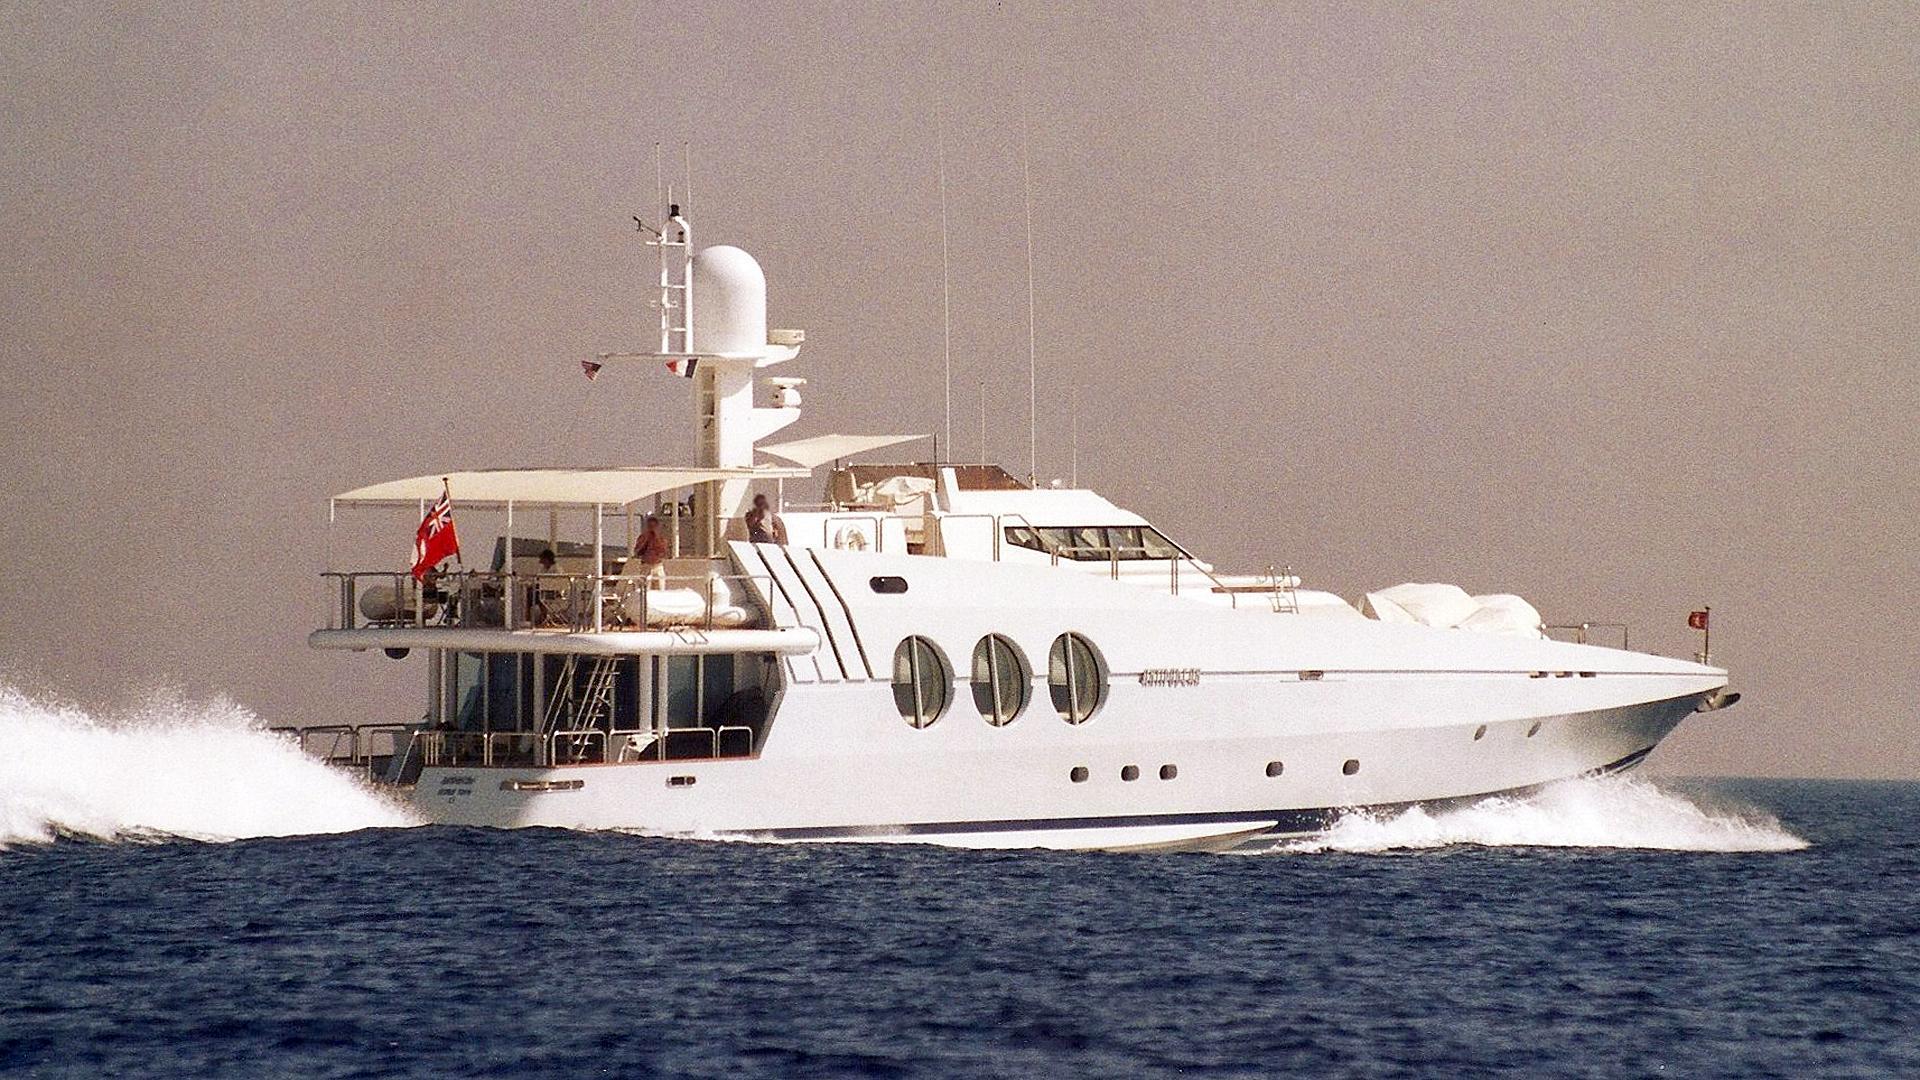 antipodean-motor-yacht-oceanfast-1987-36m-cruising